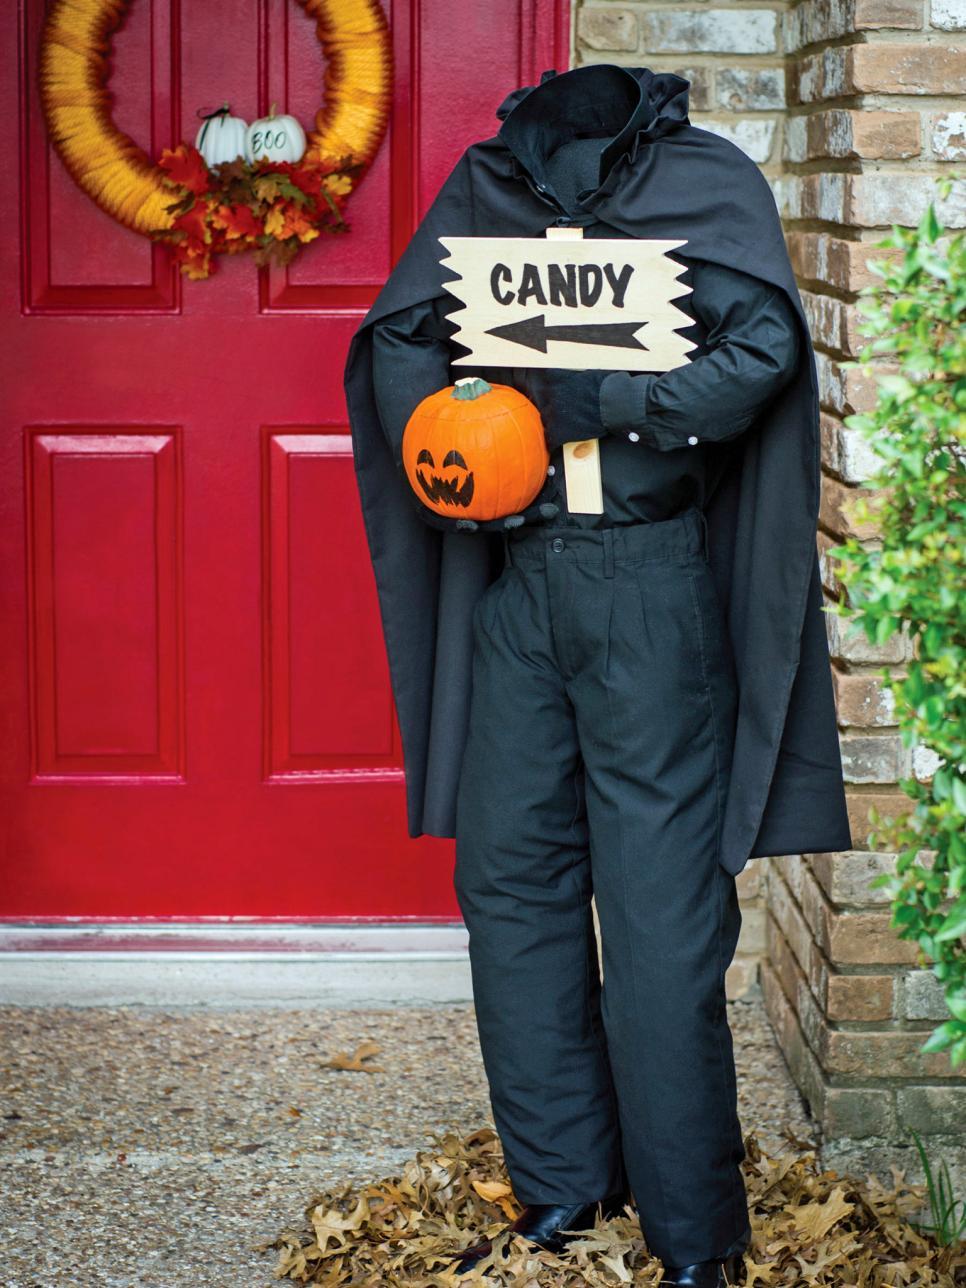 Headless Horseman Halloween Decoration ideas